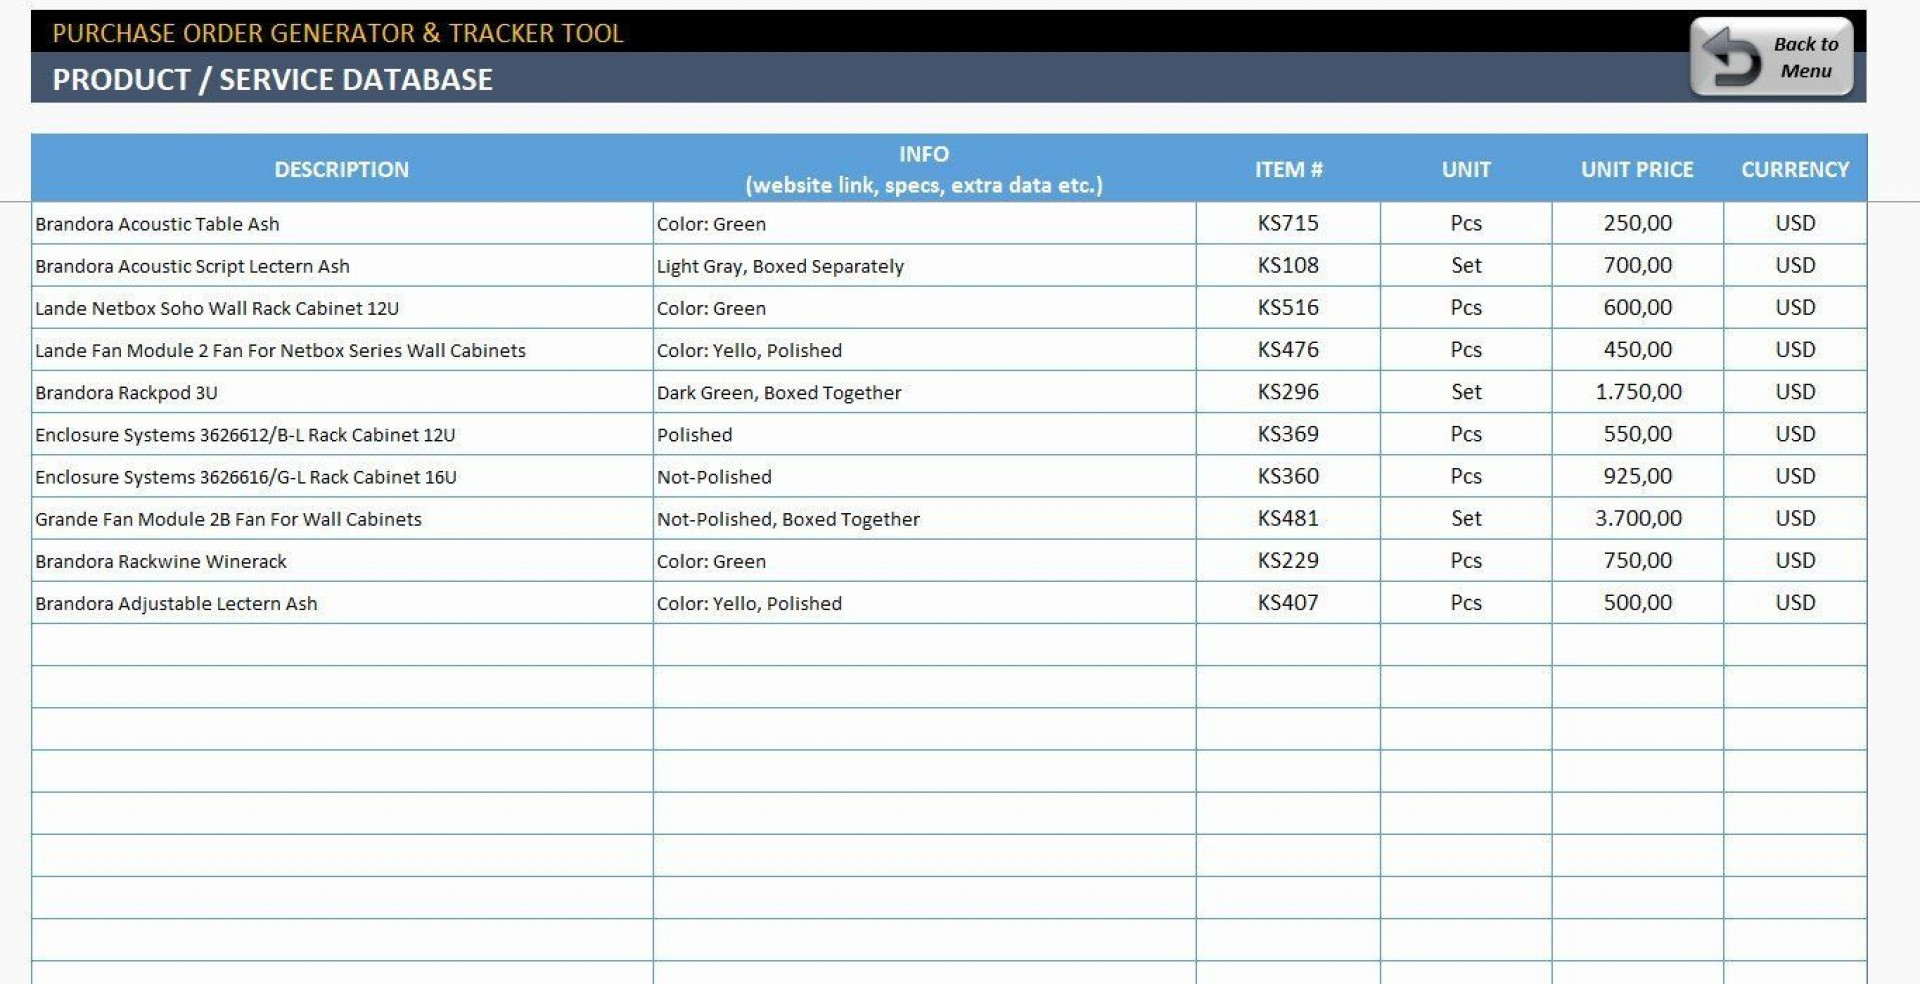 002 Beautiful Excel Spreadsheet Work Order Template Sample 1920